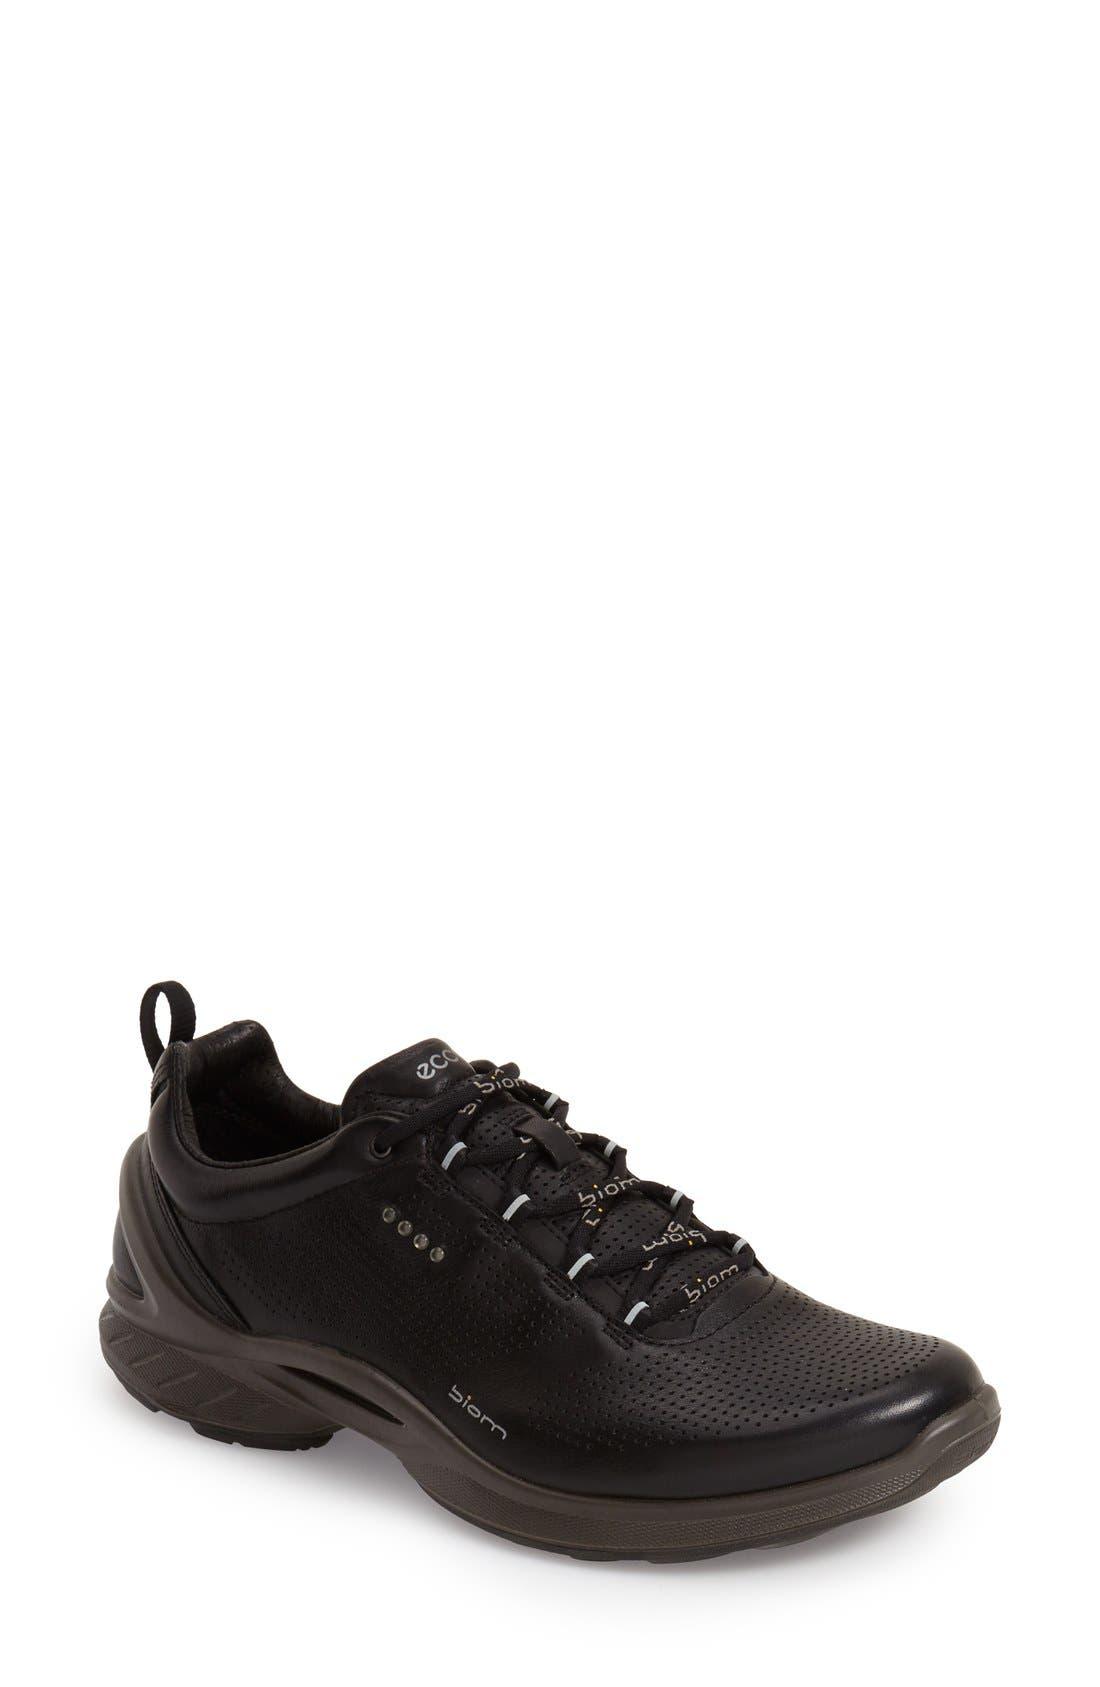 Main Image - ECCO 'Biom Fjuel' Sneaker (Women)